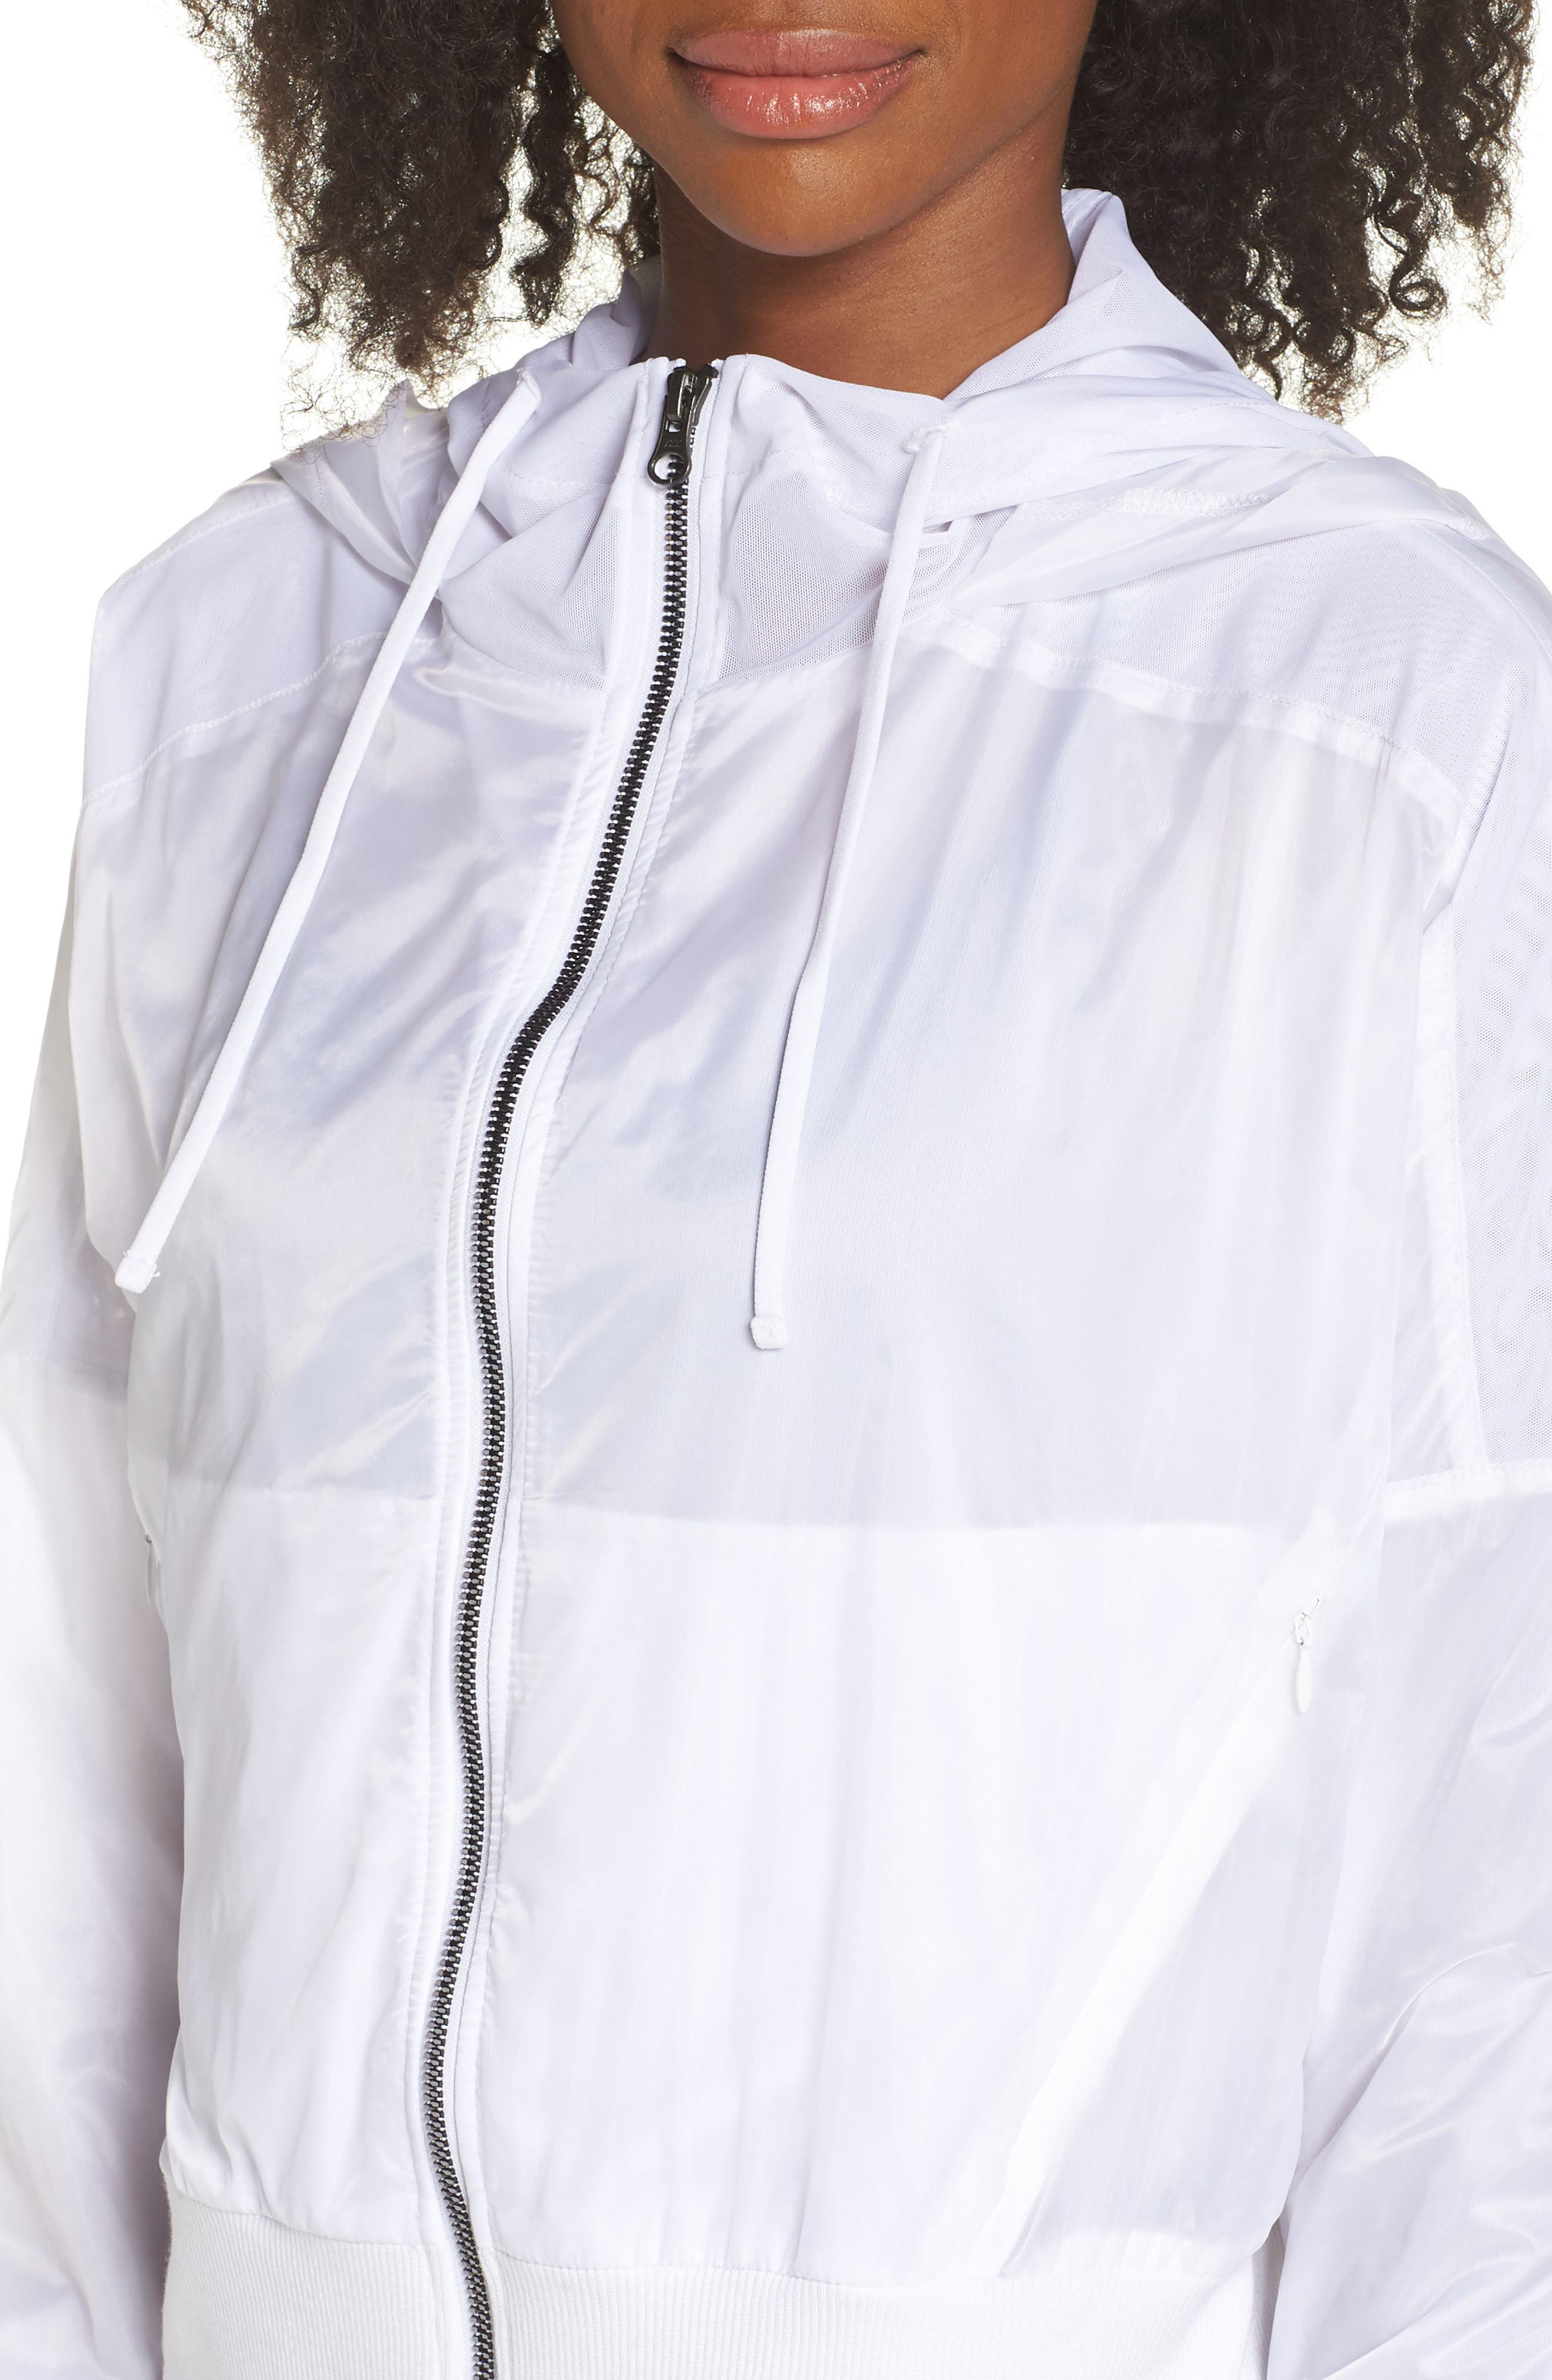 Aqua Jacket,                             Alternate thumbnail 4, color,                             White